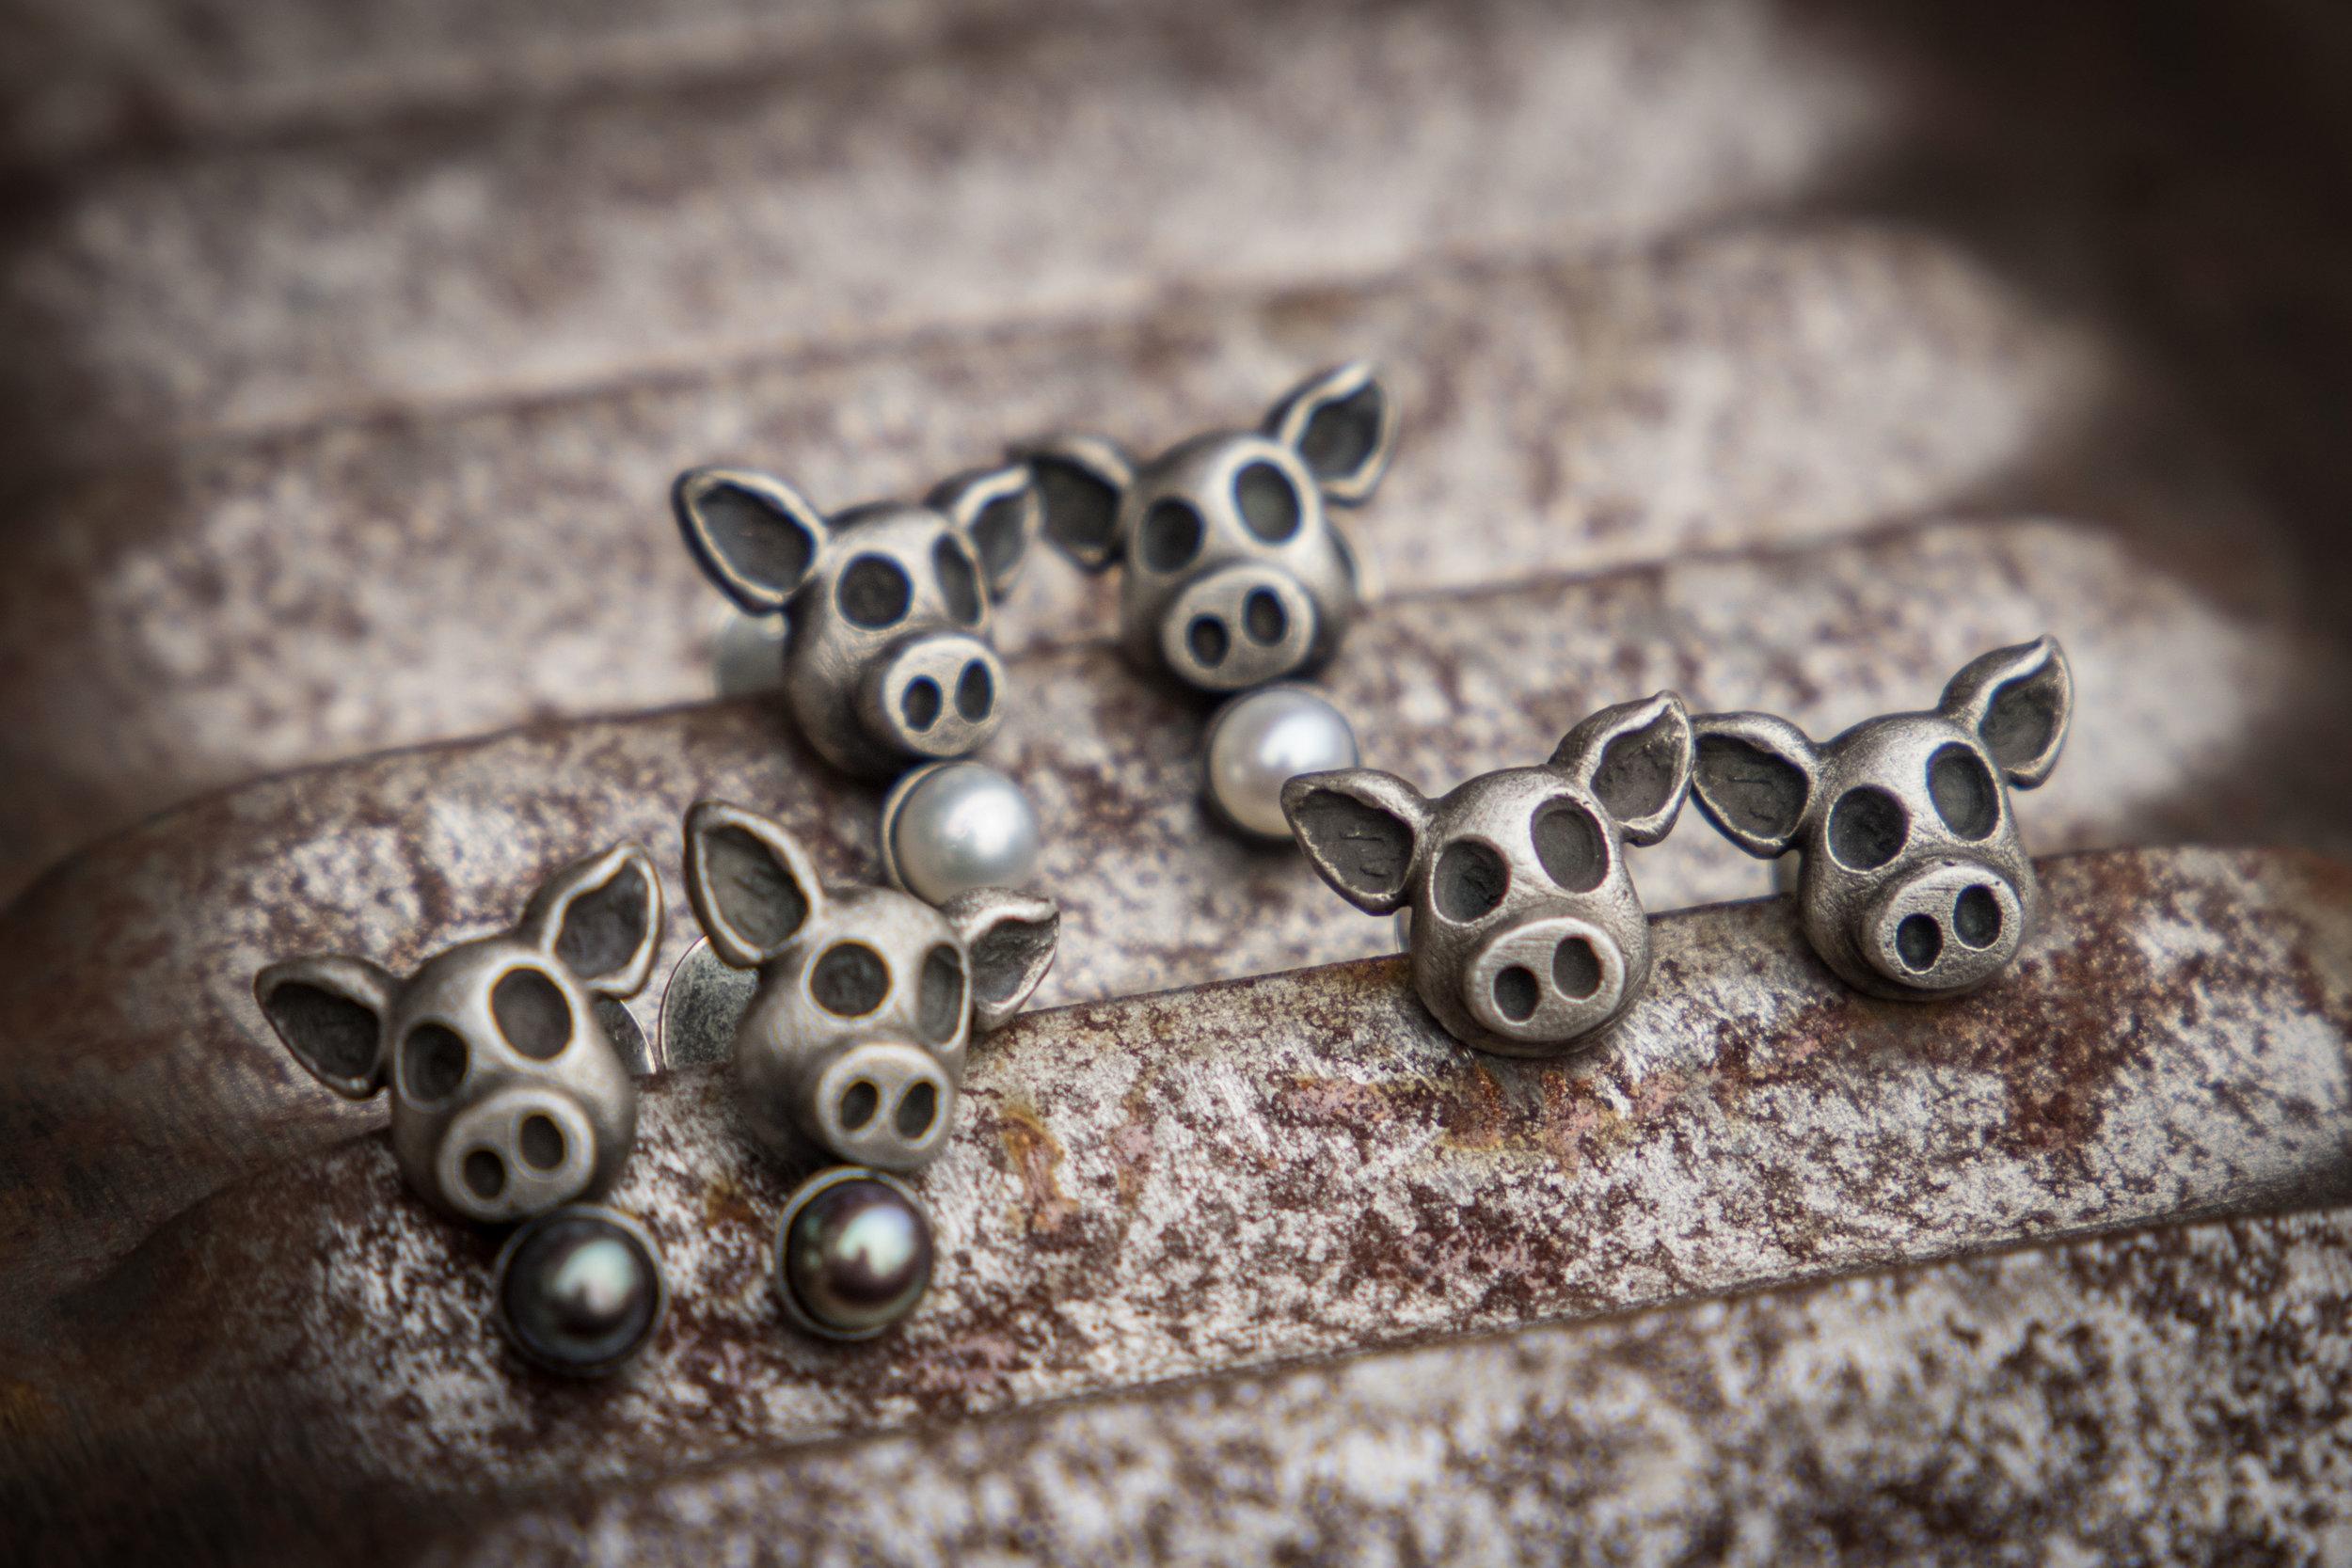 Perlen vor die Säue